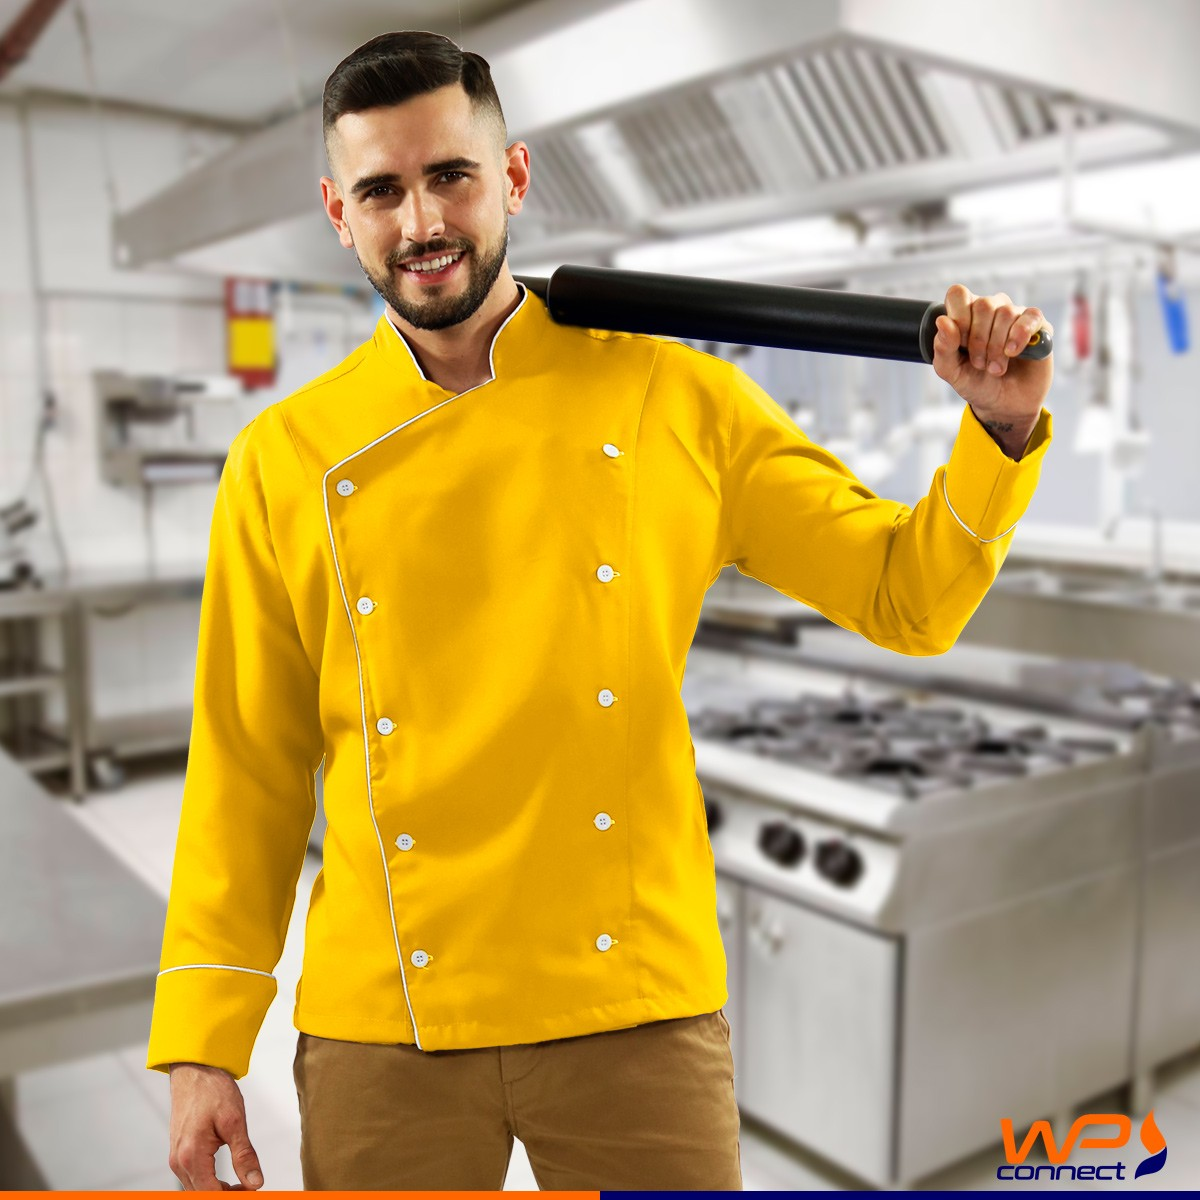 Dólmã Chef de Cozinha Amarelo Unissex Oxford 100% Poliéster